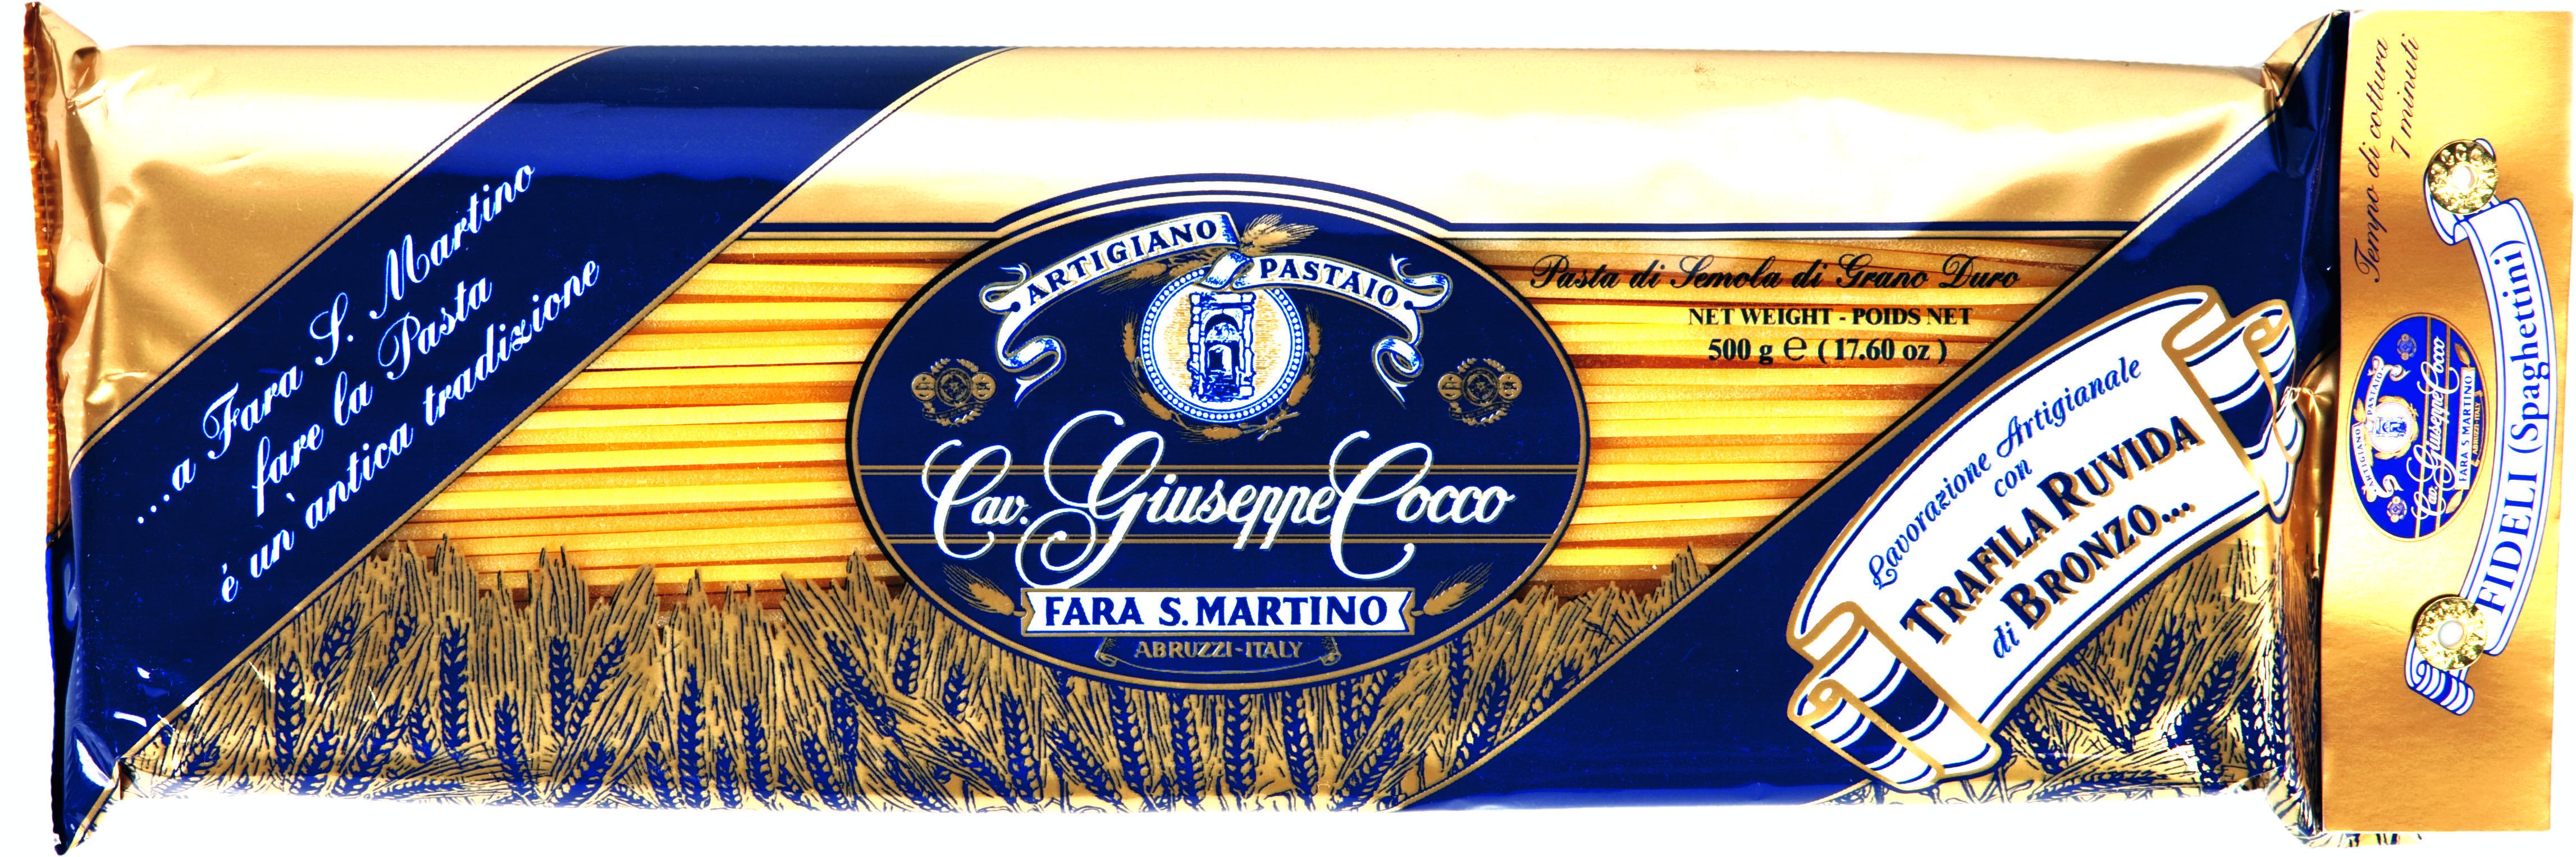 Fideli Nr 32 (Spaghettini) 500 g Packung Cocco